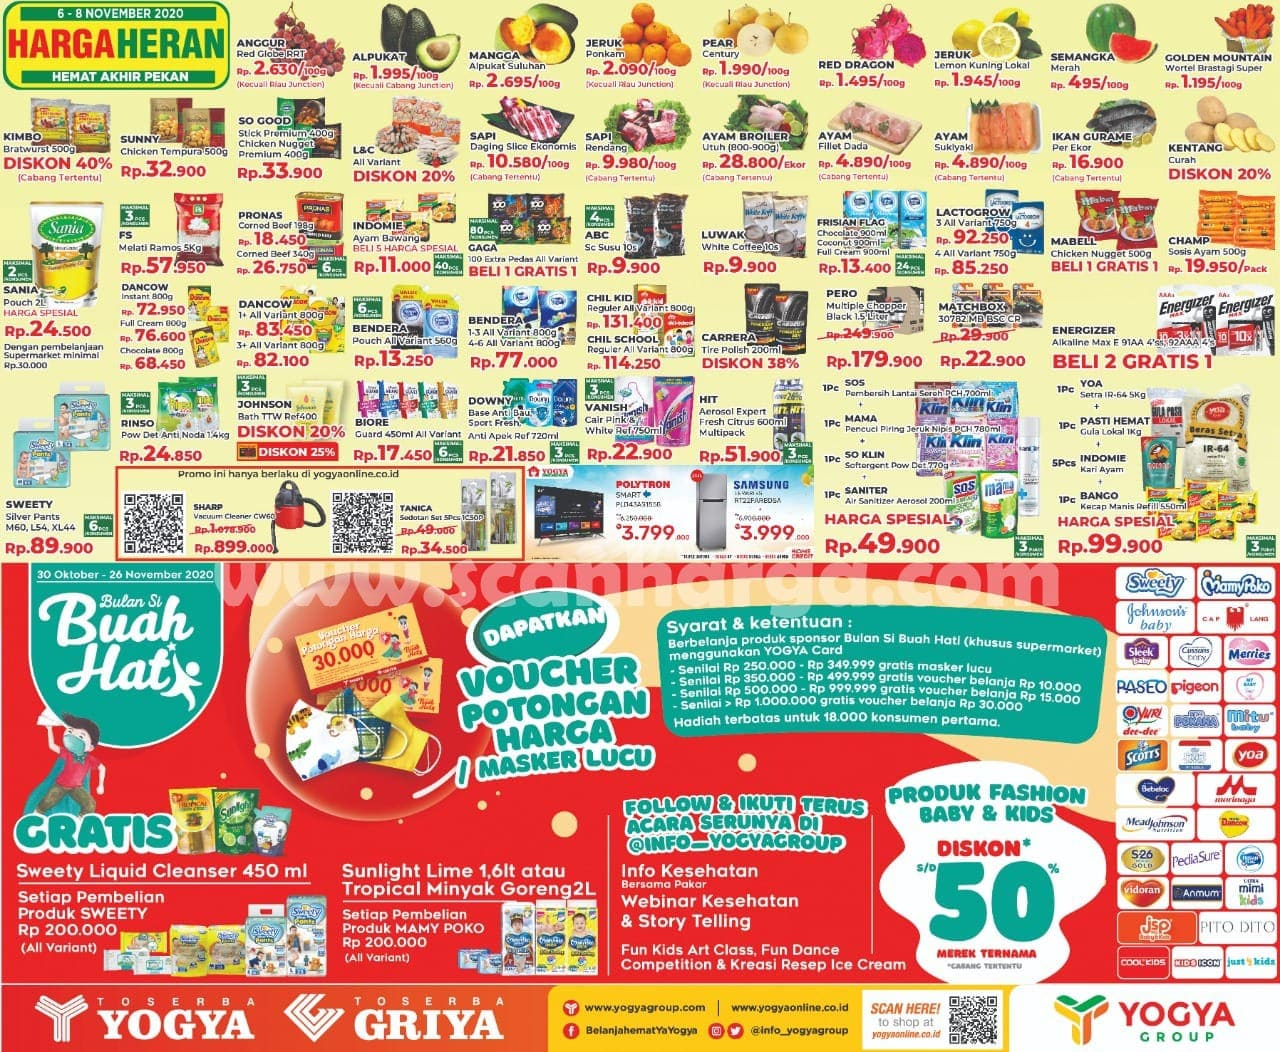 Promo Toserba Yogya Harga Heran Hemat Akhir Pekan 6 8 November 2020 Scanharga